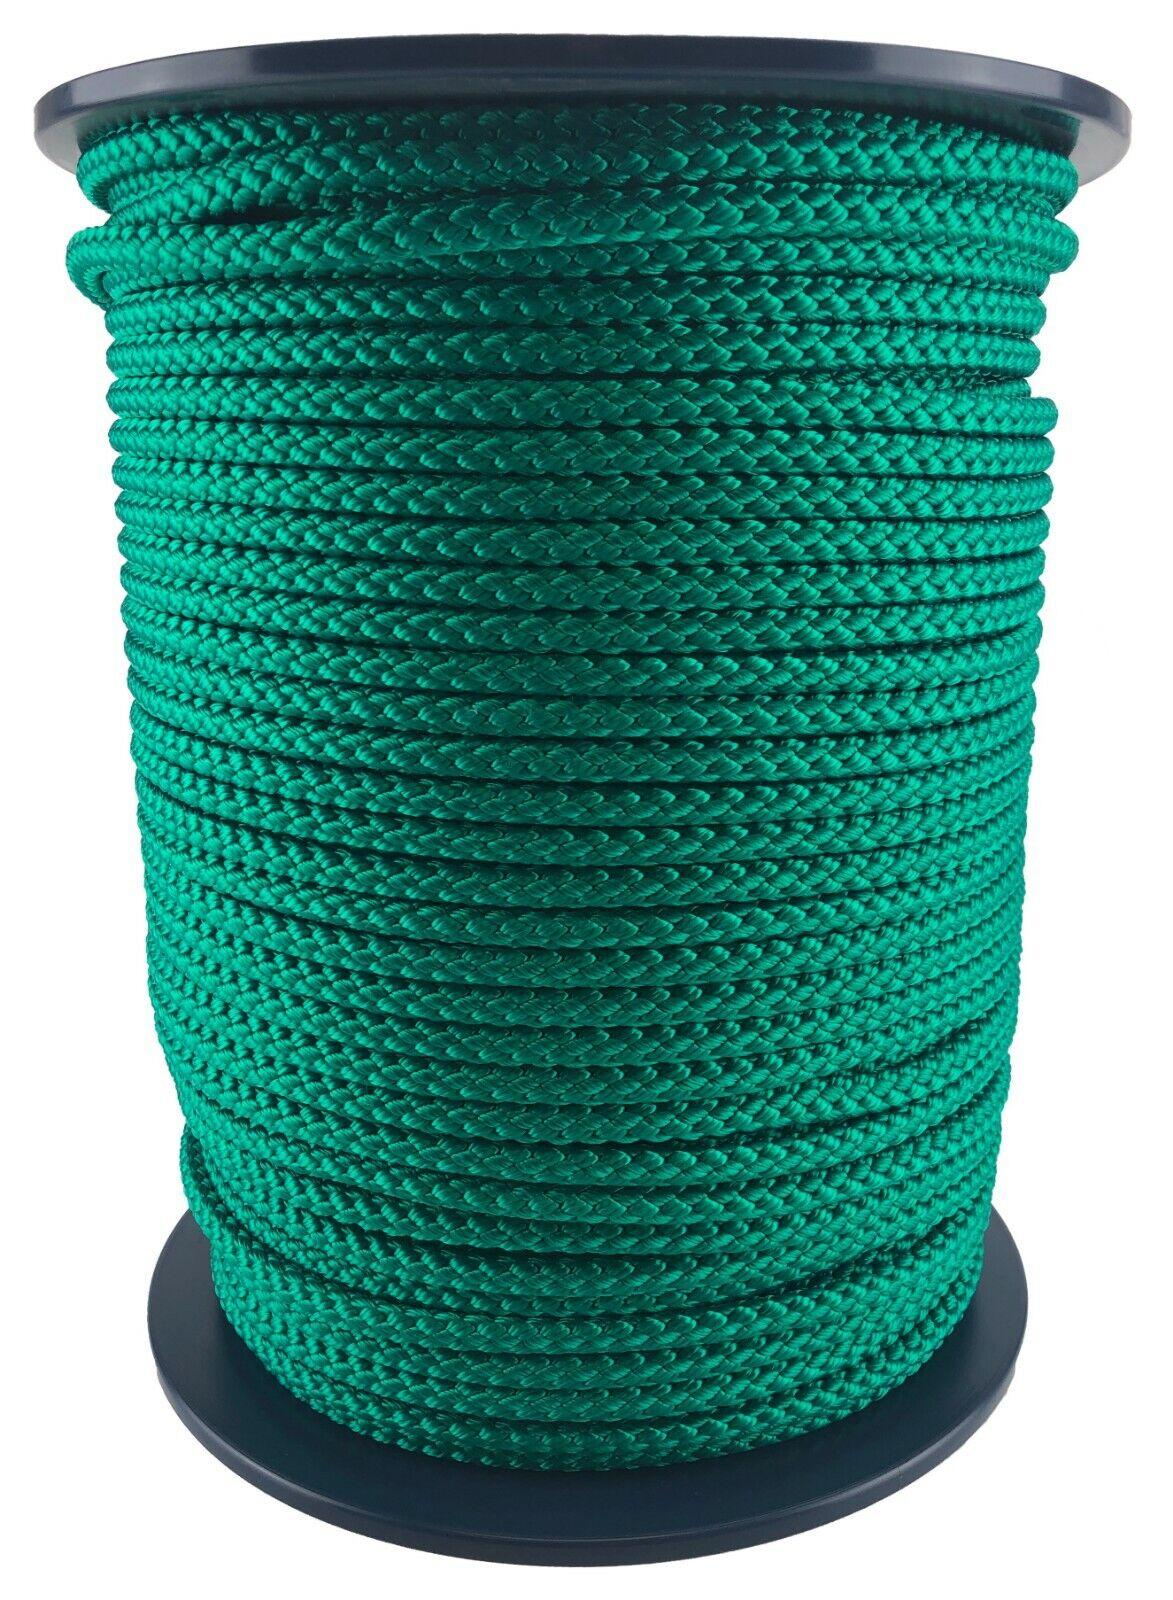 12mm Green Braided Polypropylene Rope x 35 Metres, Paracord Drawstring Camping